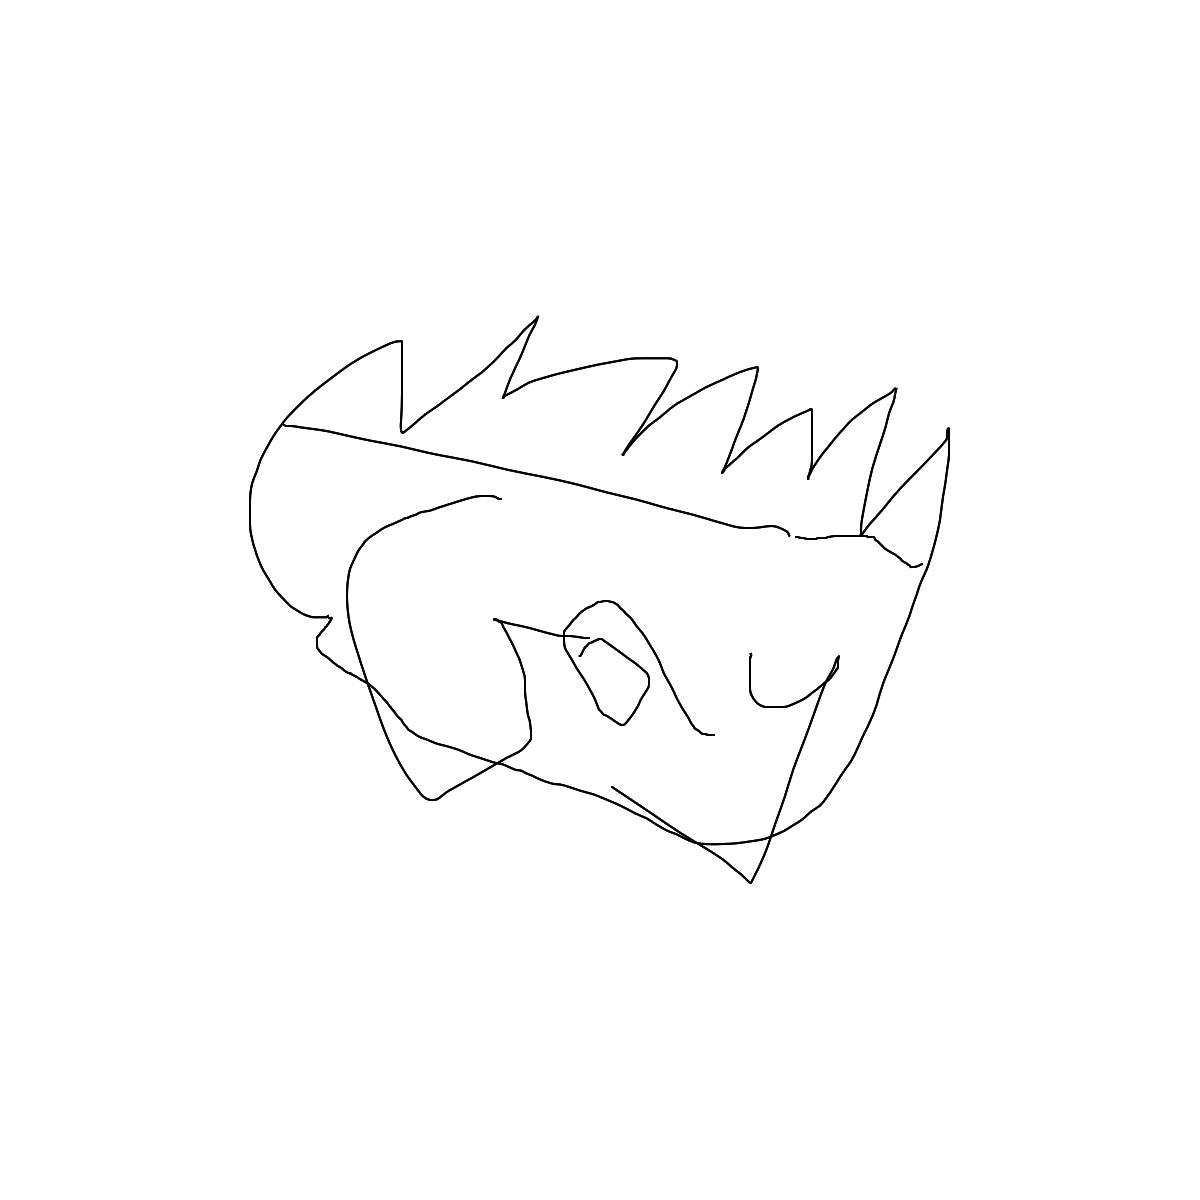 BAAAM drawing#2568 lat:41.8745880126953100lng: -87.9166564941406200